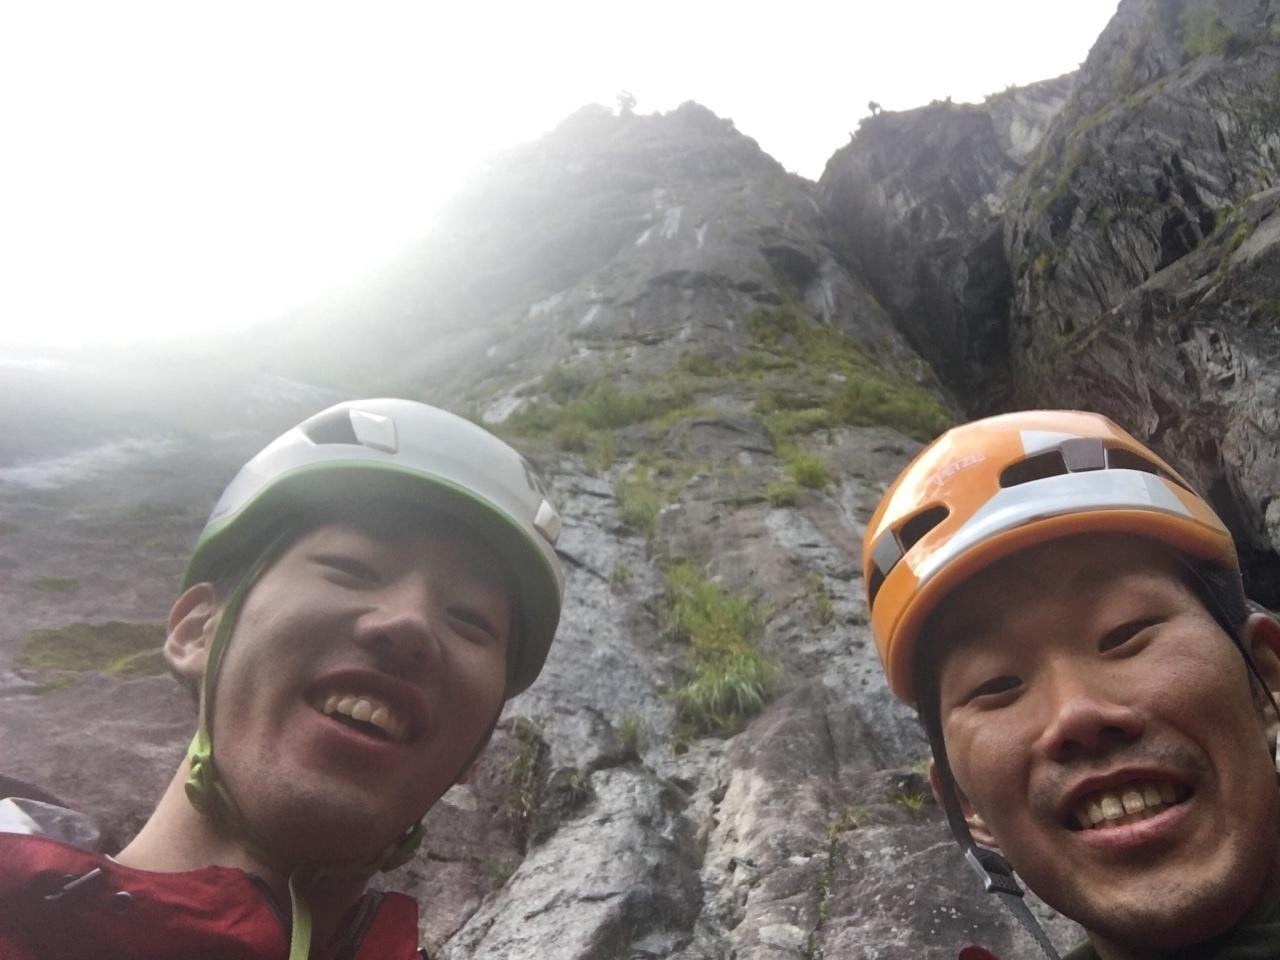 写真_仙田先輩と丸山東壁緑ルート